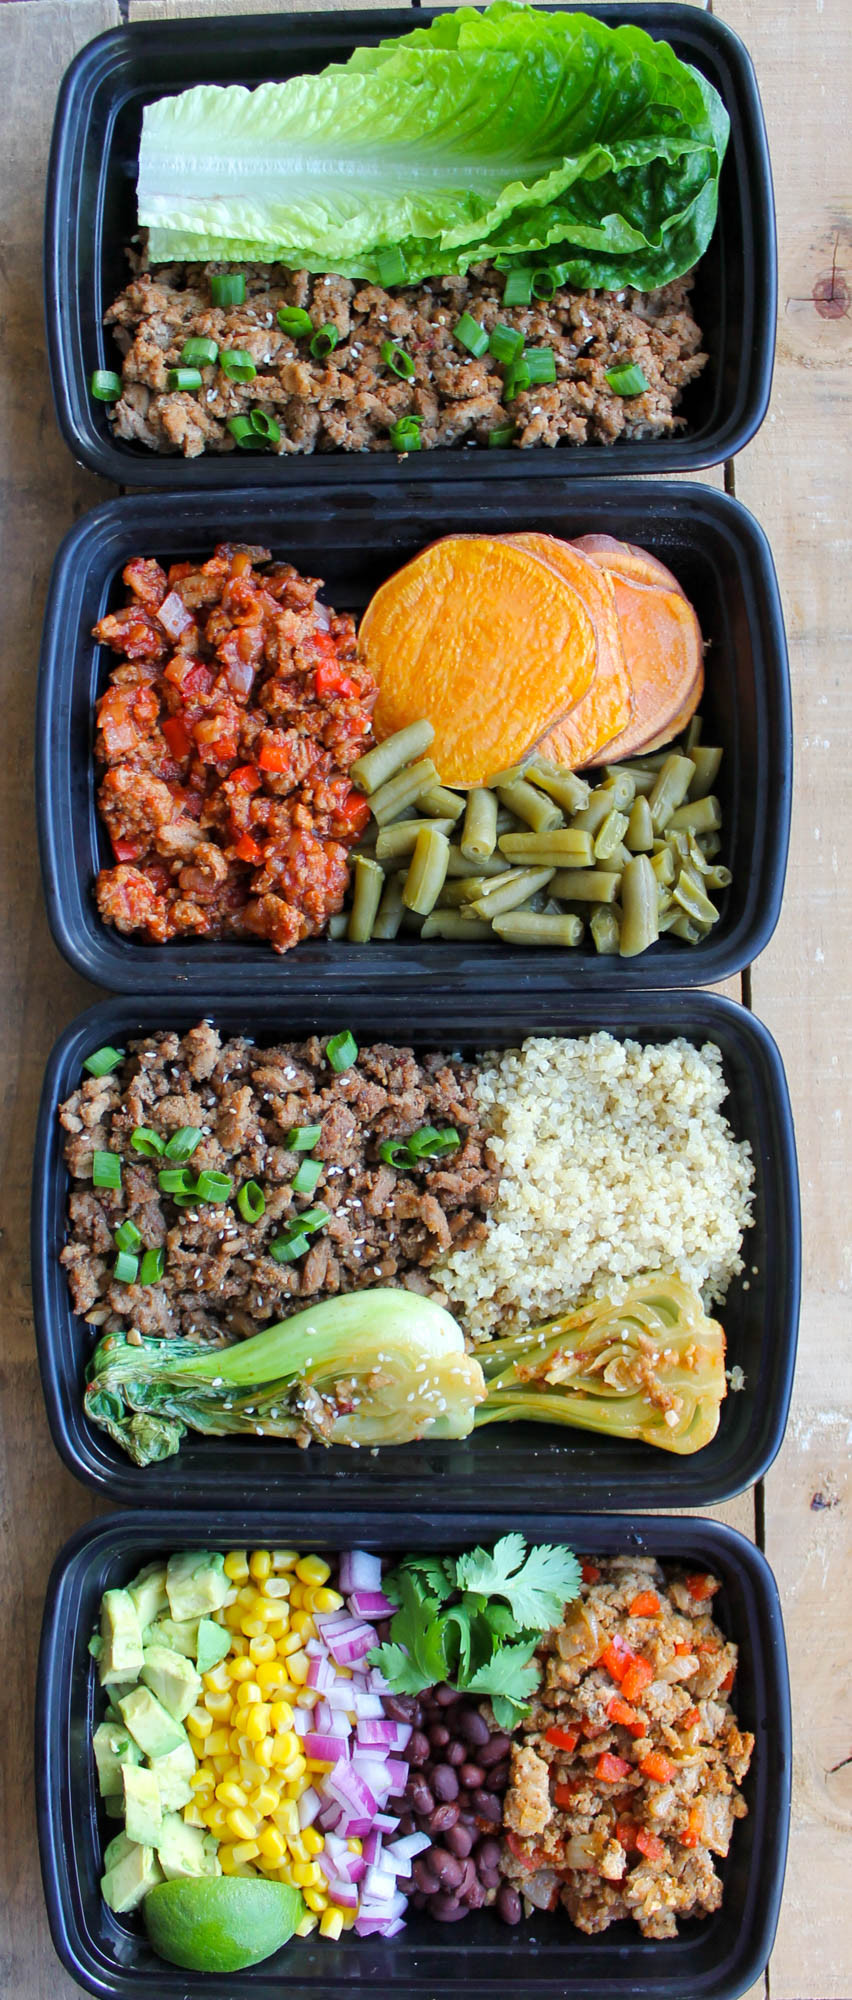 Healthy Meals With Ground Turkey  Easy Ground Turkey Meal Prep Bowls 4 Ways Smile Sandwich